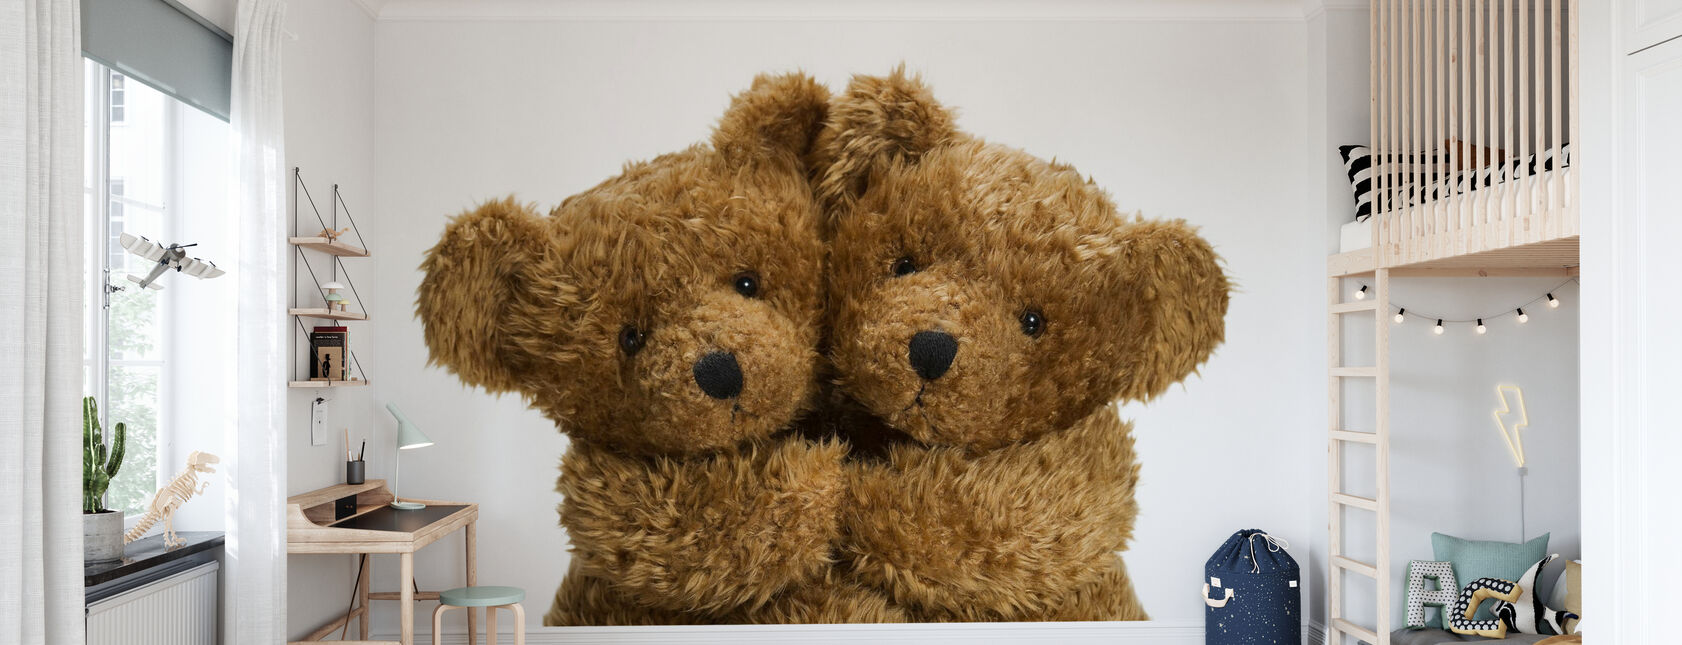 Cuddling Teddy Bears - Wallpaper - Kids Room